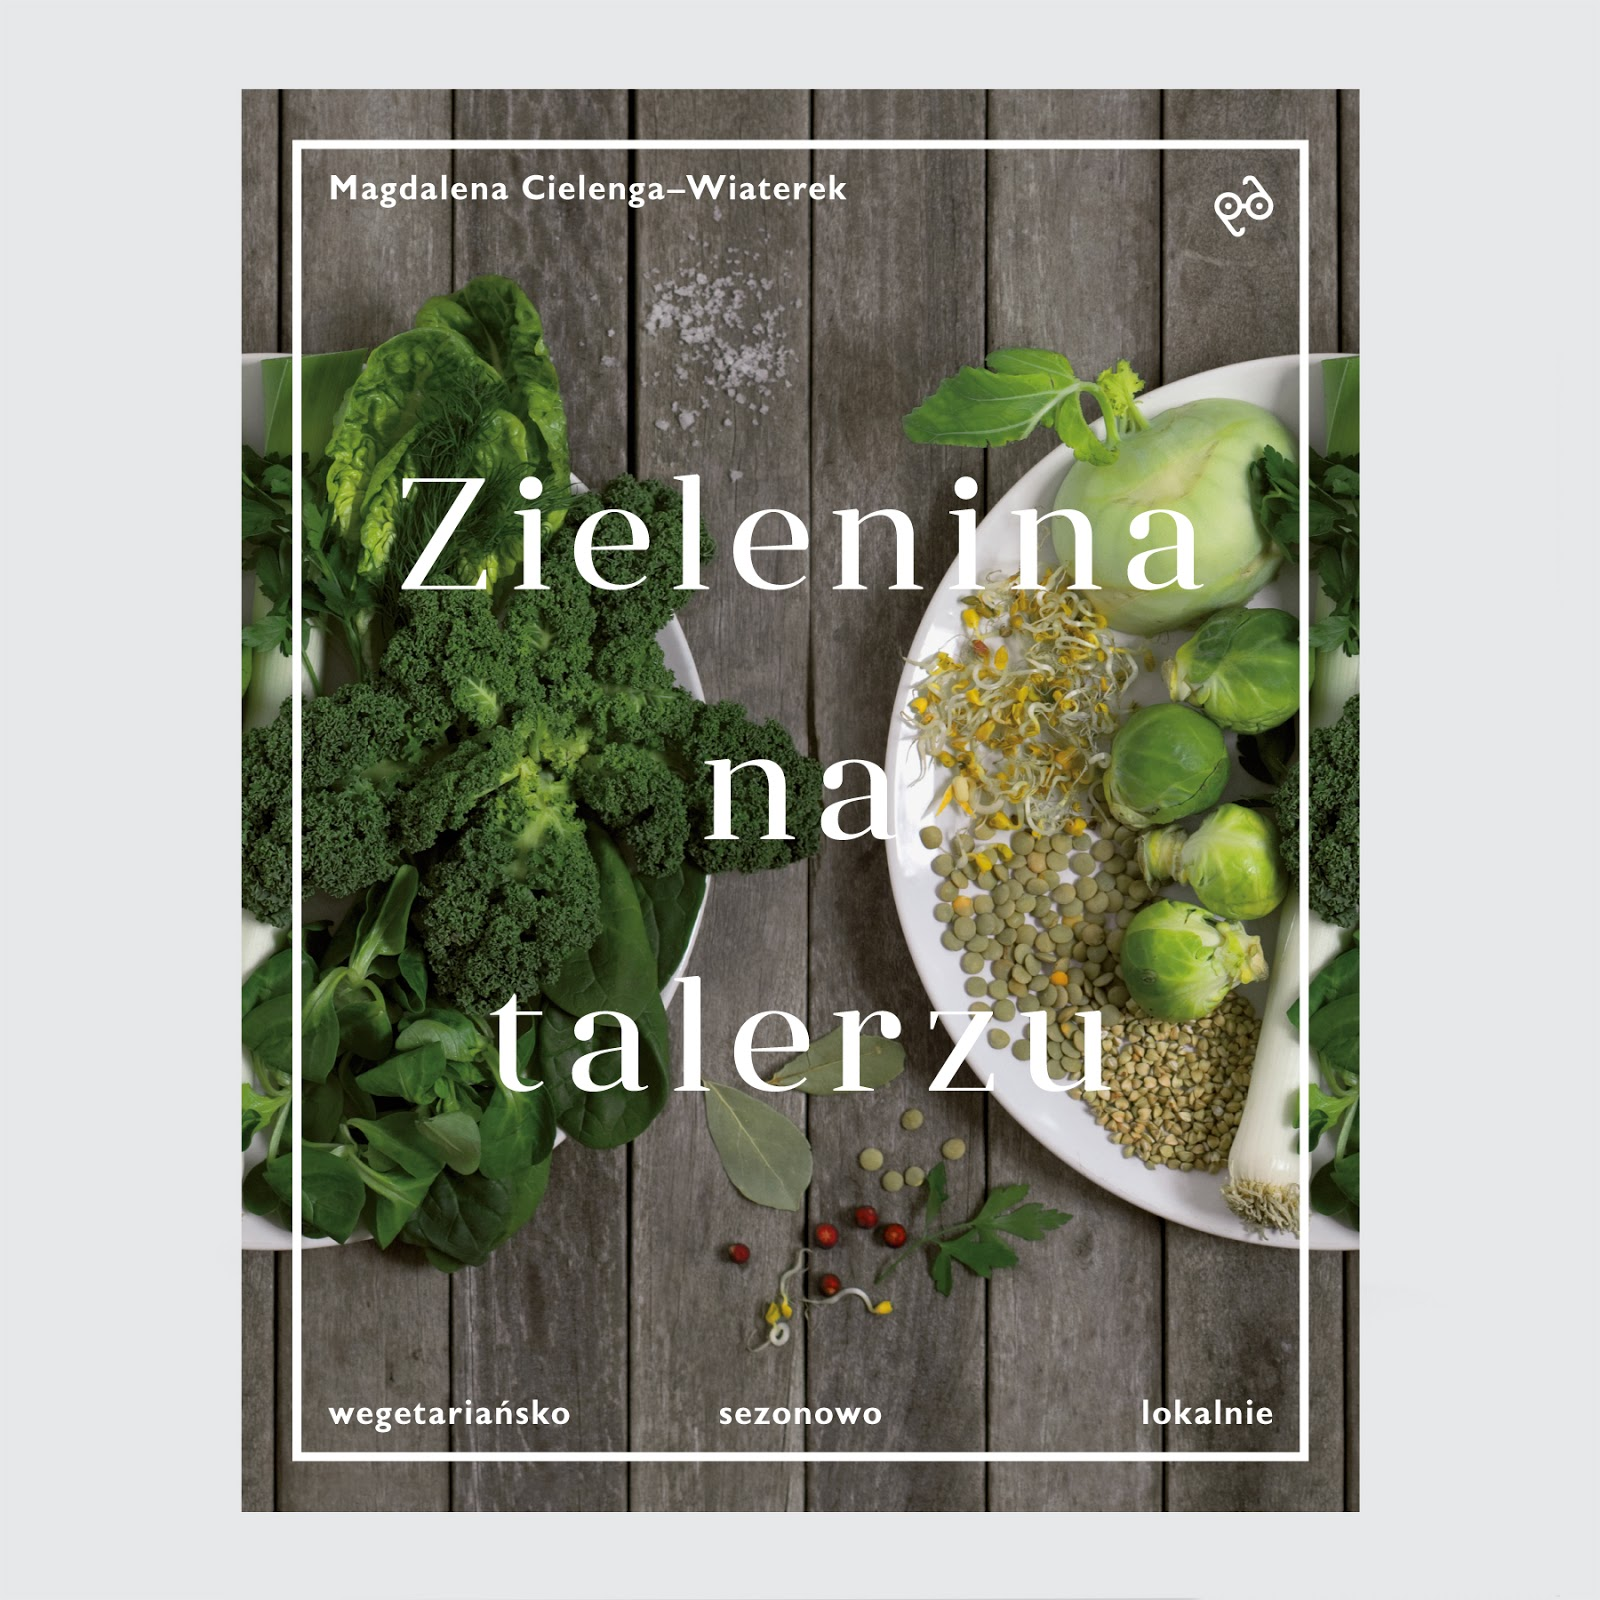 http://www.empik.com/zielenina-na-talerzu-wegetariansko-sezonowo-lokalnie-cielenga-wiaterek-magdalena,p1106426516,ksiazka-p